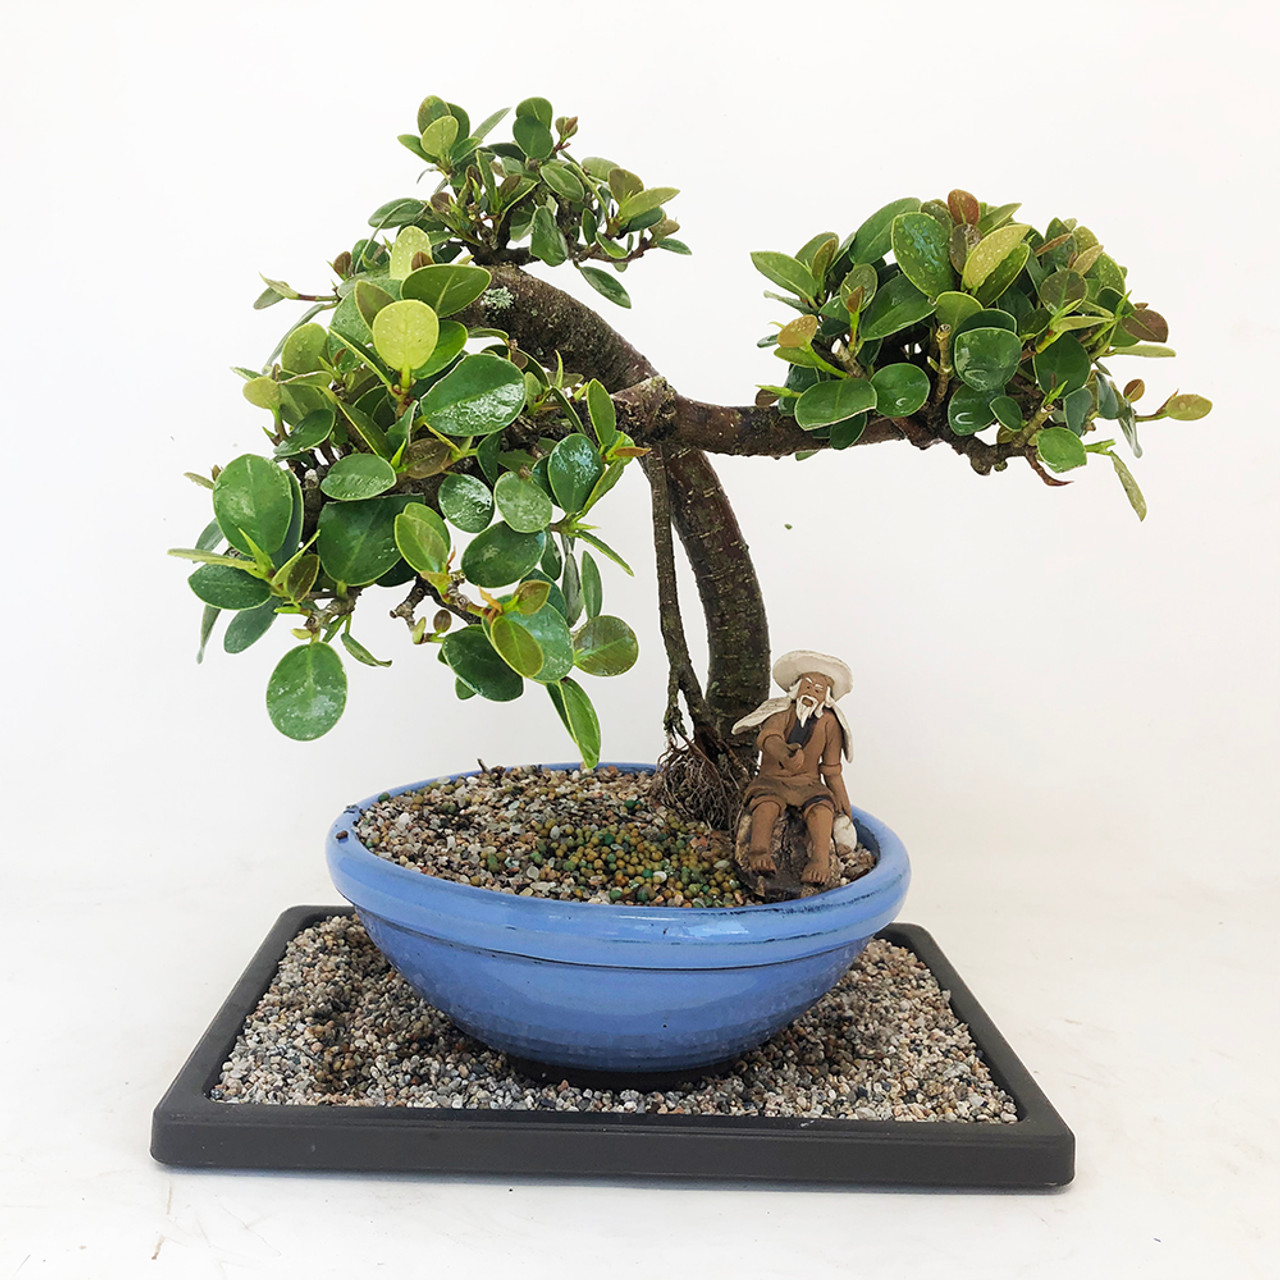 Green Island Ficus Bonsai Tree Bonsai Outlet